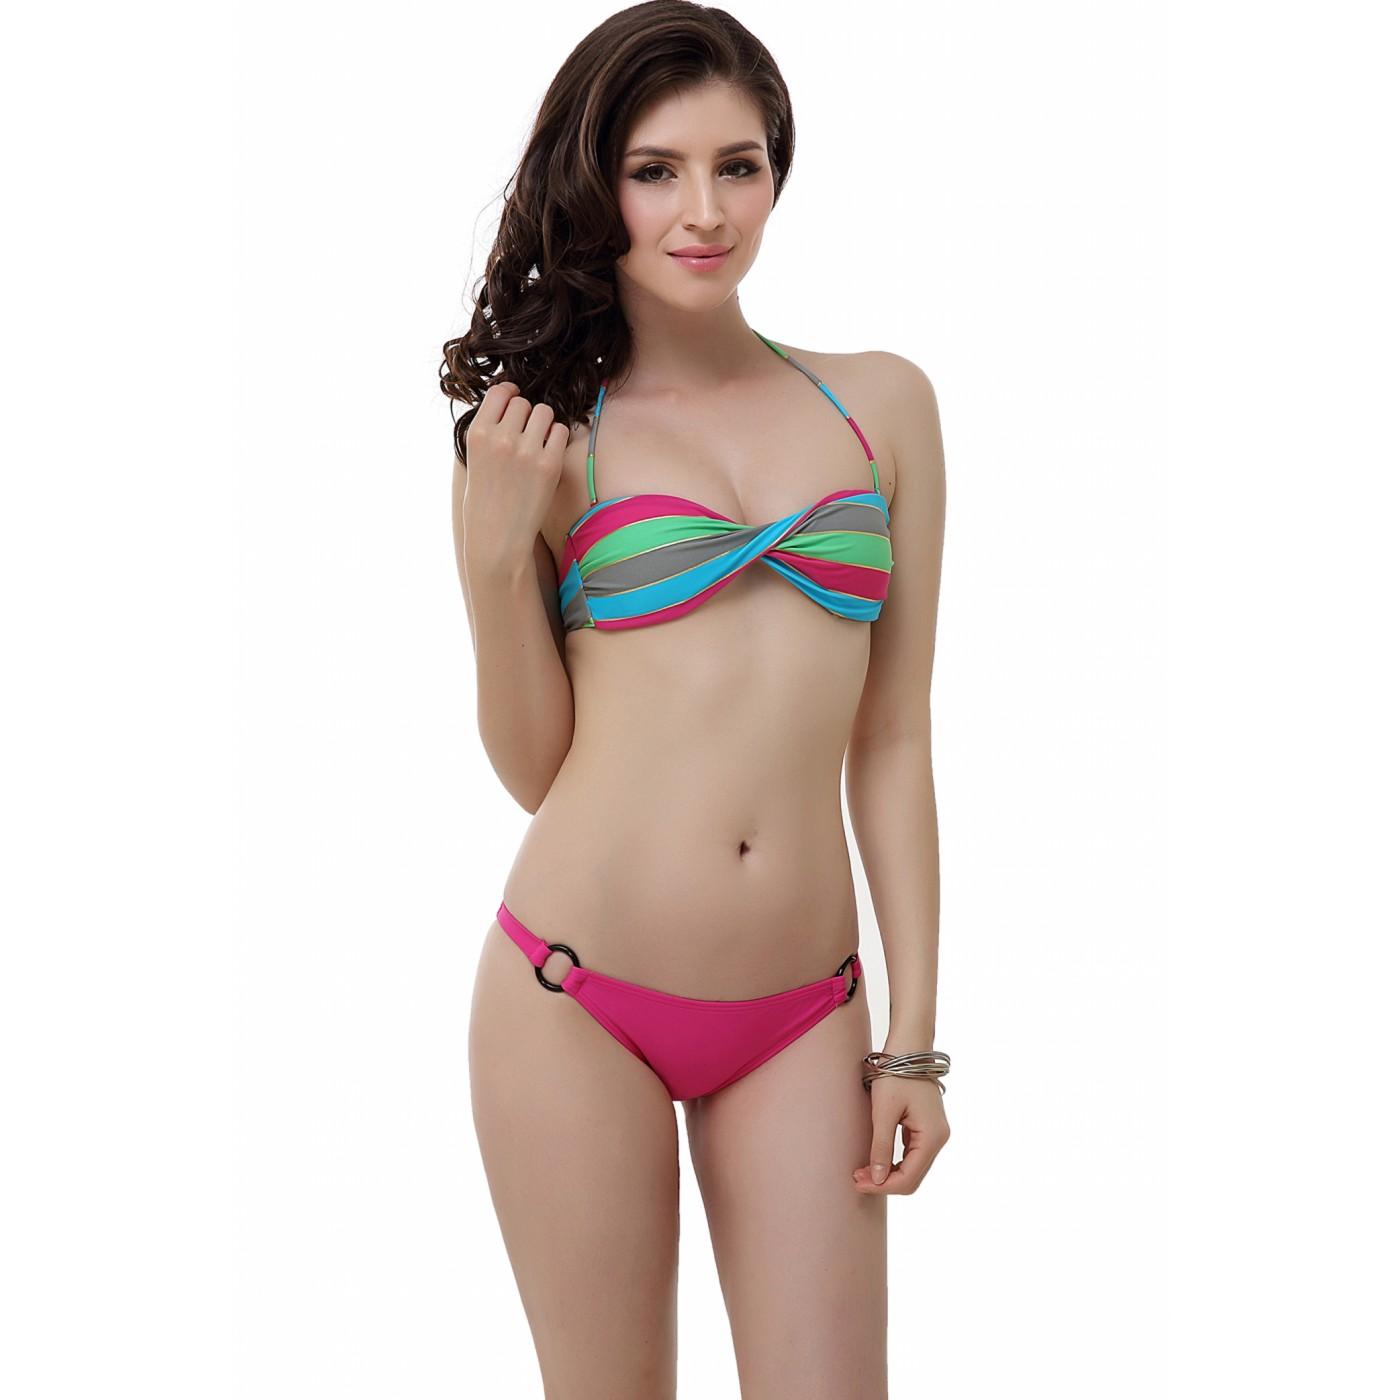 a75af76206552 Luxury Lane  Miss Adola Women s Bikini Top   Bottom 2-Piece Swimwear ...